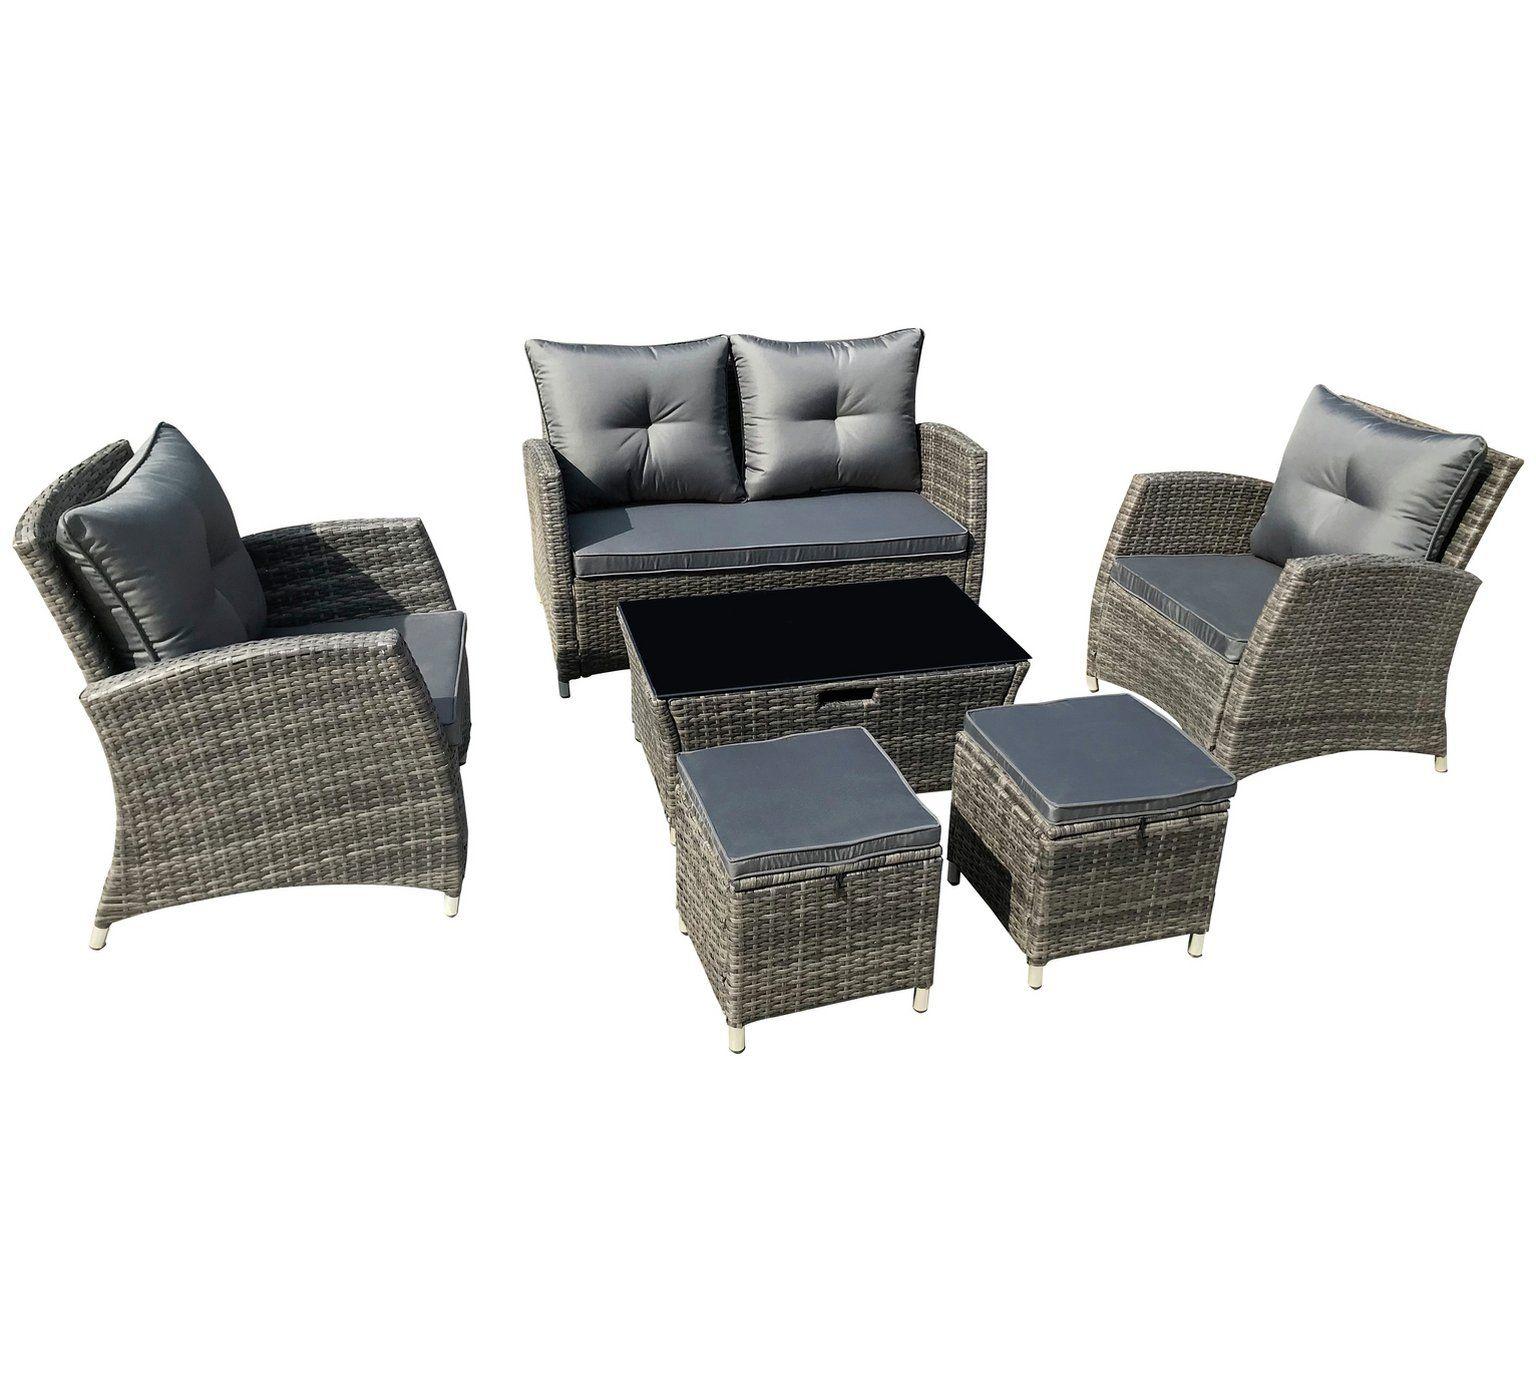 Home 6 Seater Rattan Effect Sofa Set Brown Sofa set